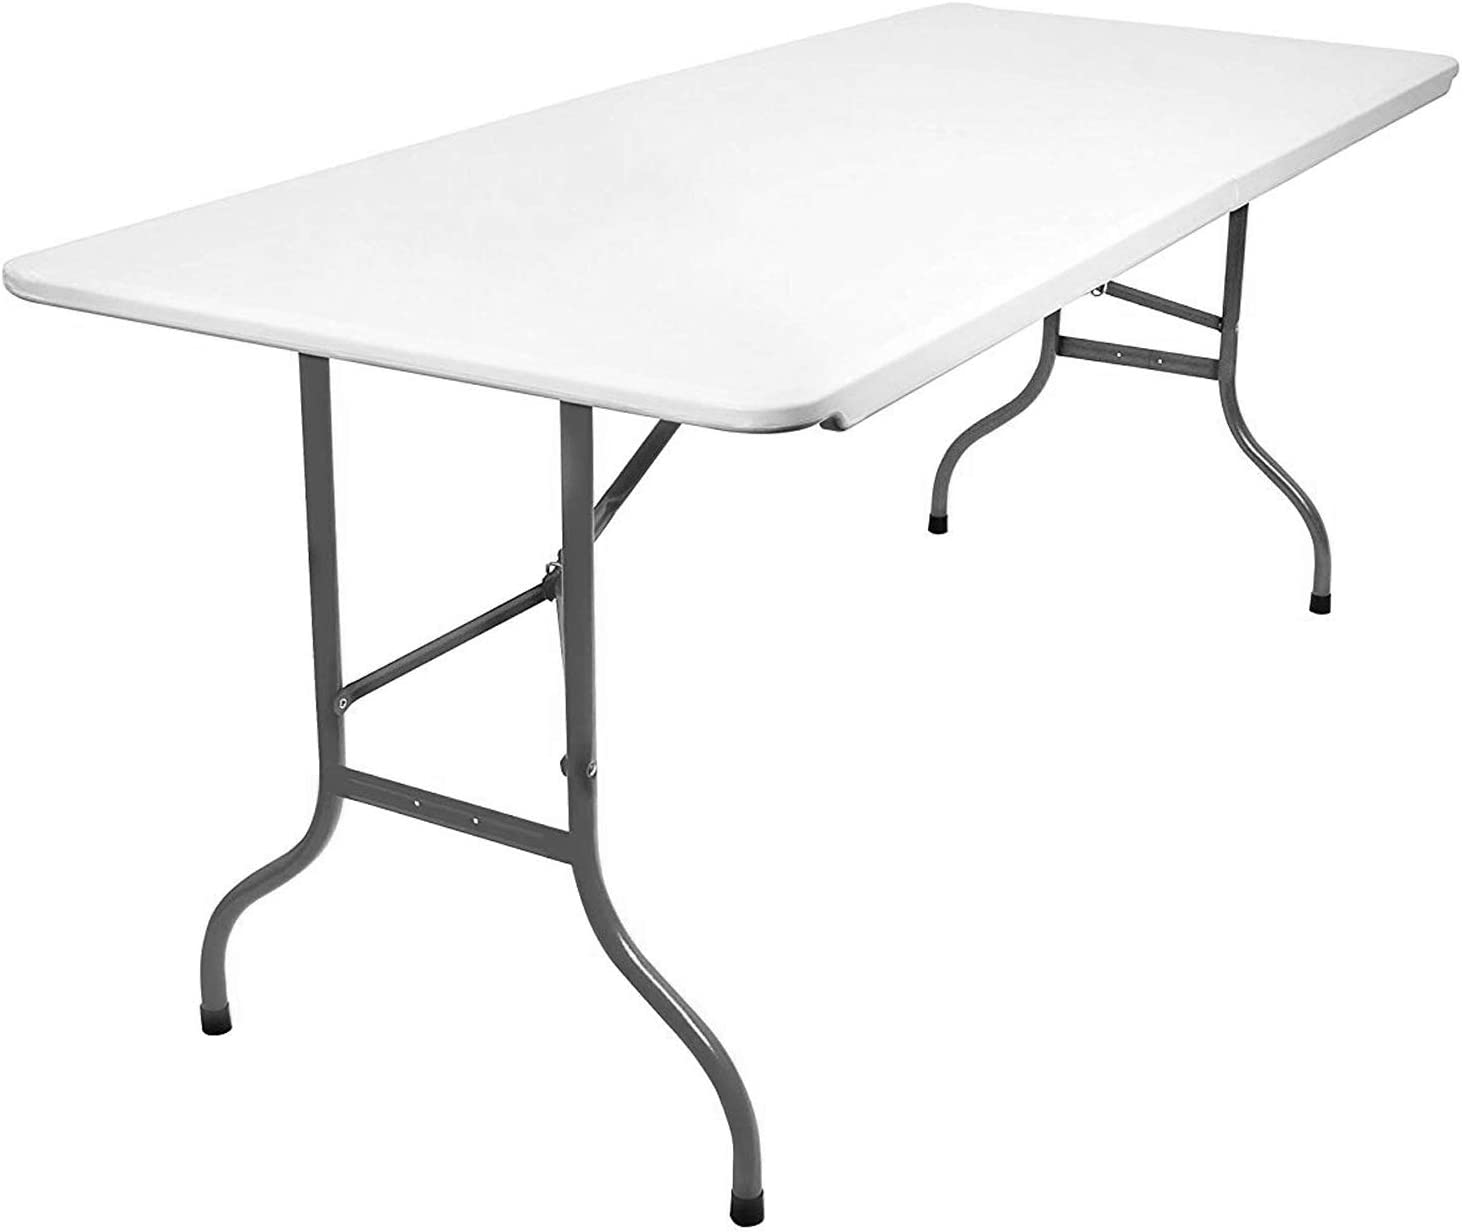 Vanage Mesa Plegable para Jardín, Terraza, Camping, Blanco; Gris; Negro, Mesa de Buffet de plástico, 180x75x74 cm